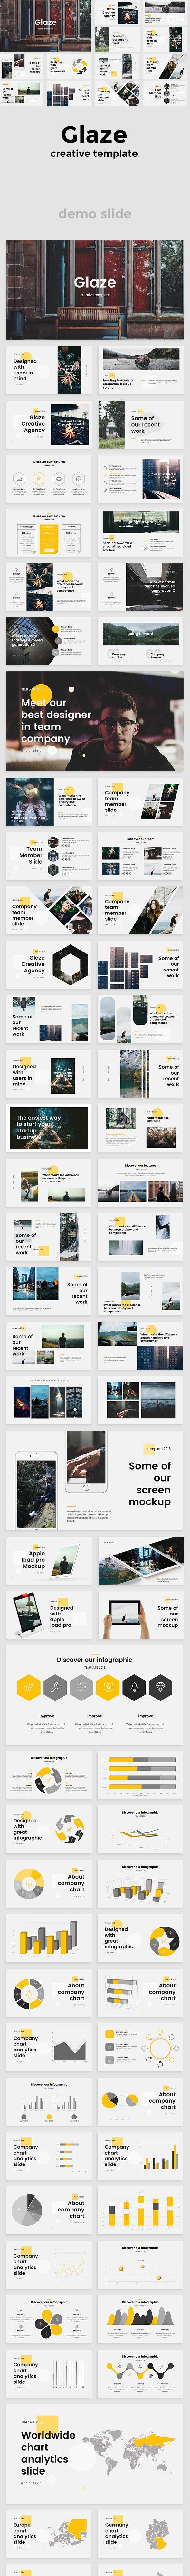 Glaze Creative Powerpoint Template - Creative PowerPoint Templates